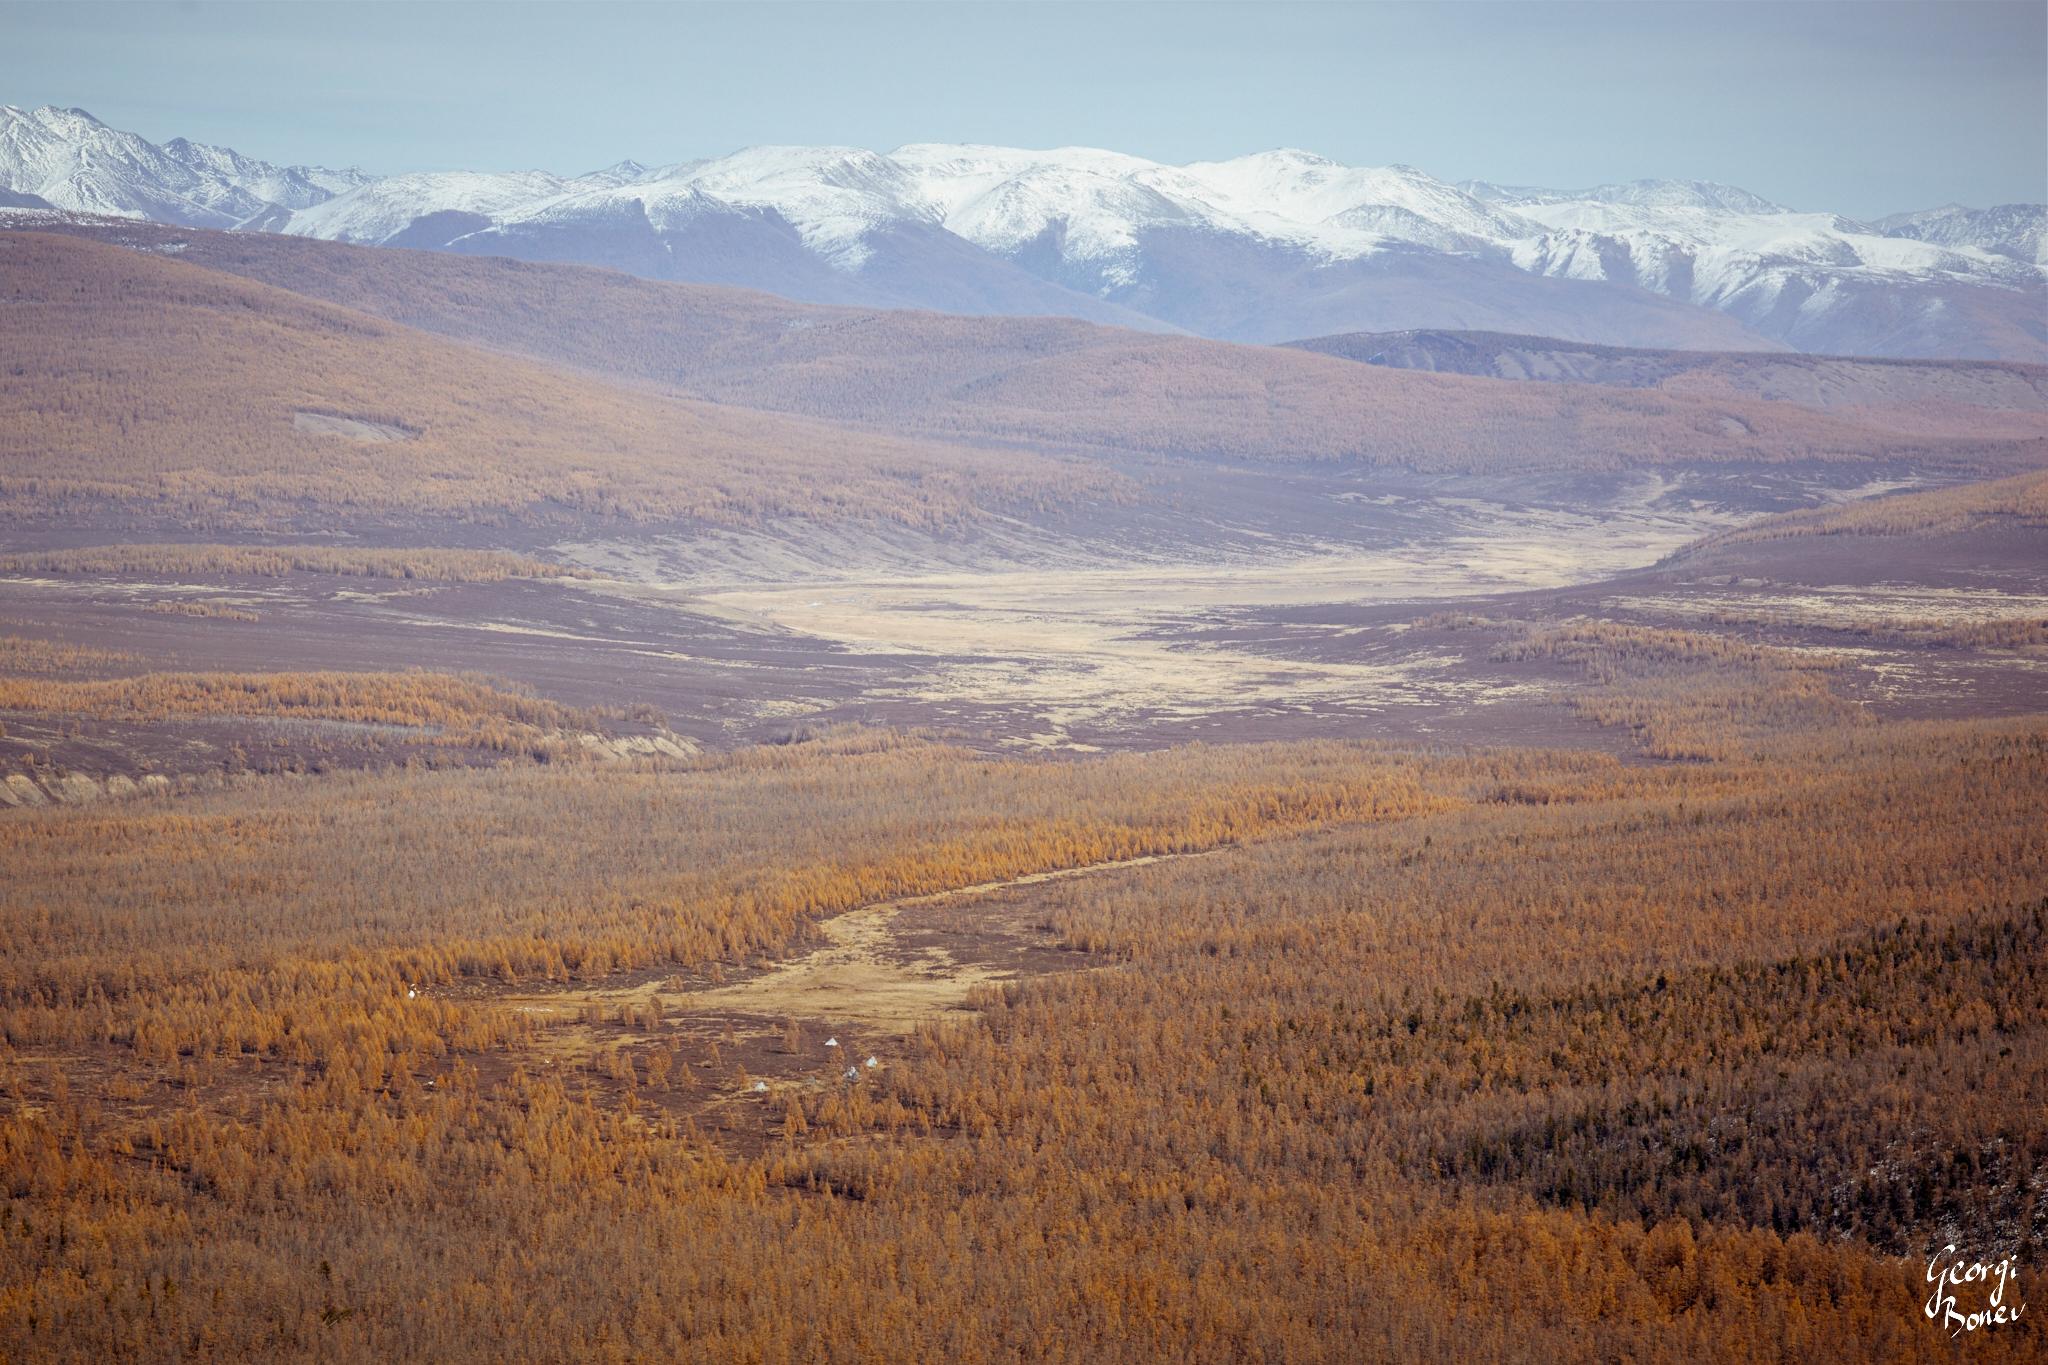 SAYAN MOUNTAIN AND THE TSAATAN CAMP IN THE TAIGA, MONGOLIA